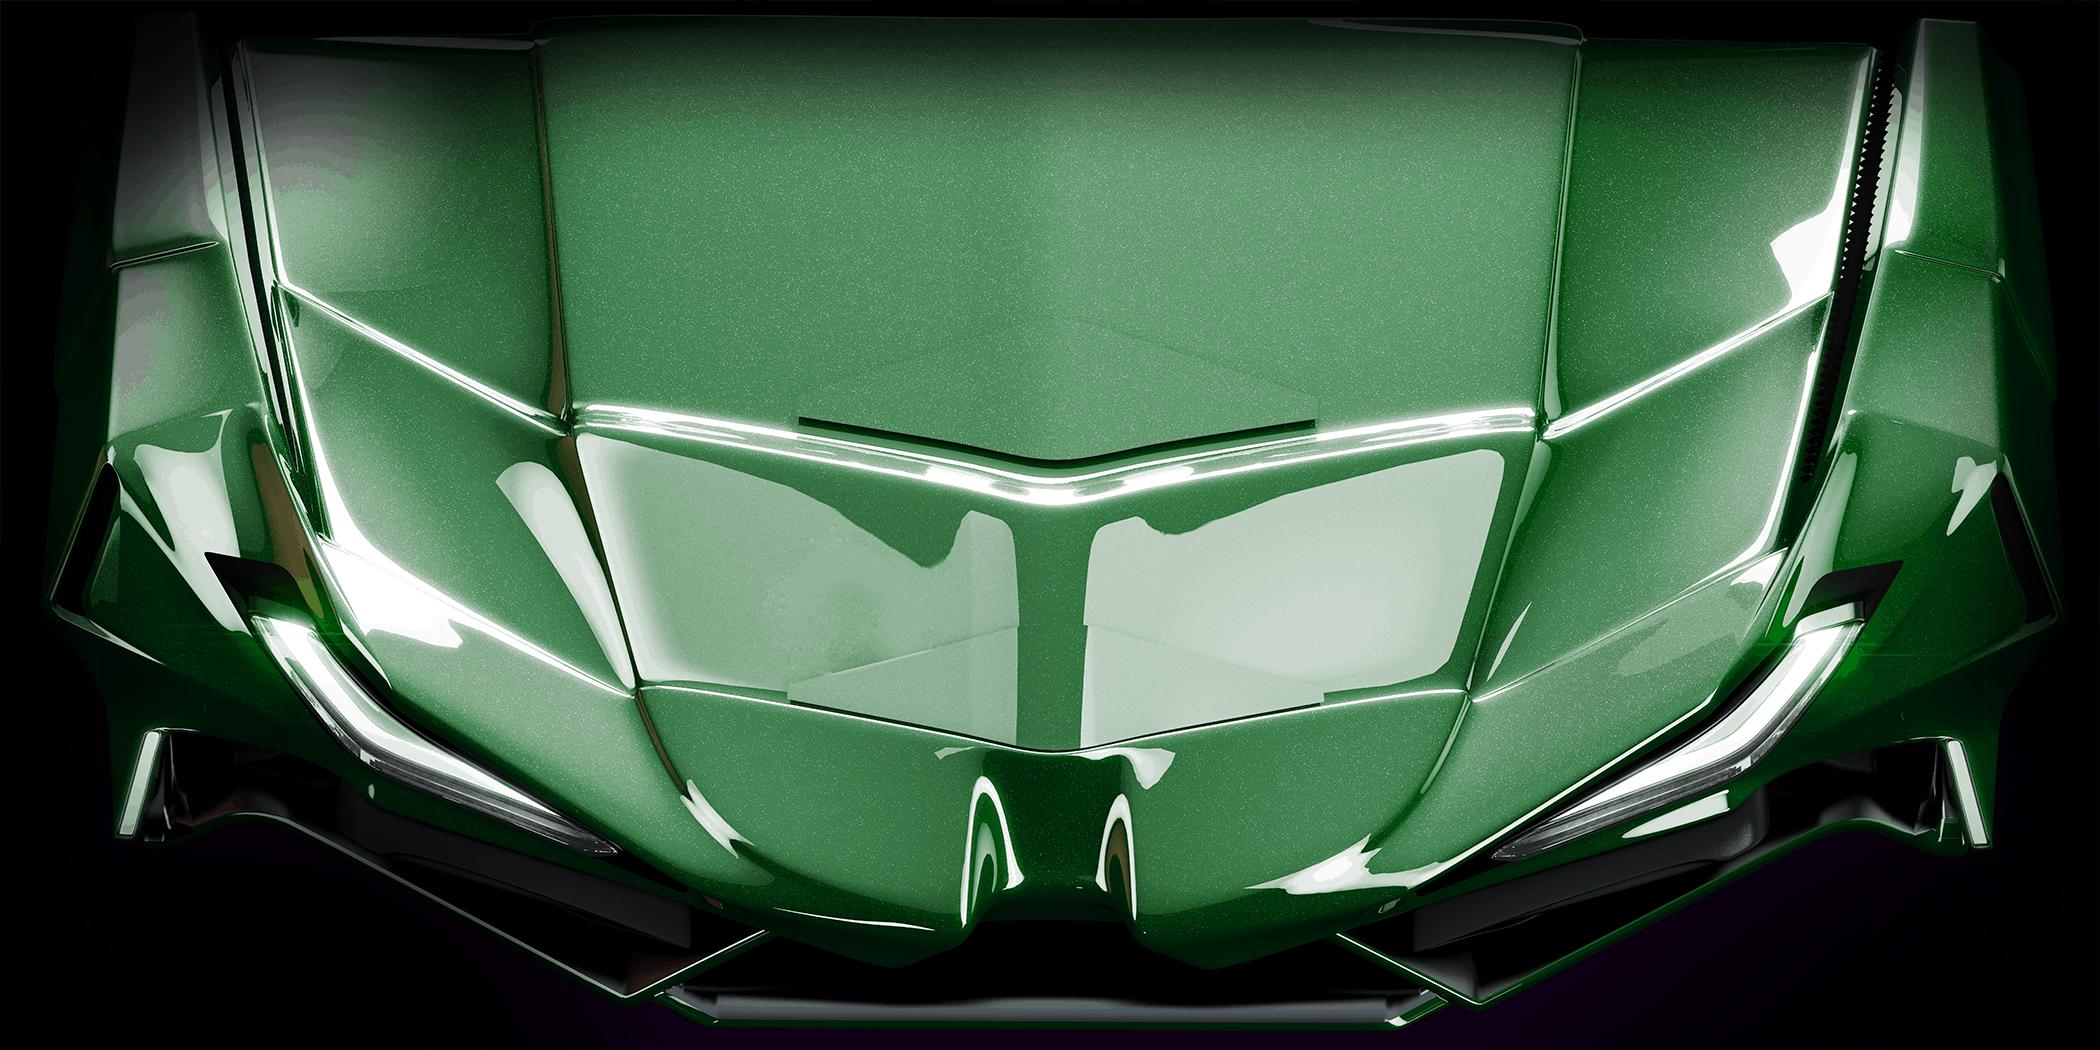 The NEW Incredible Hulk Coaster revealed